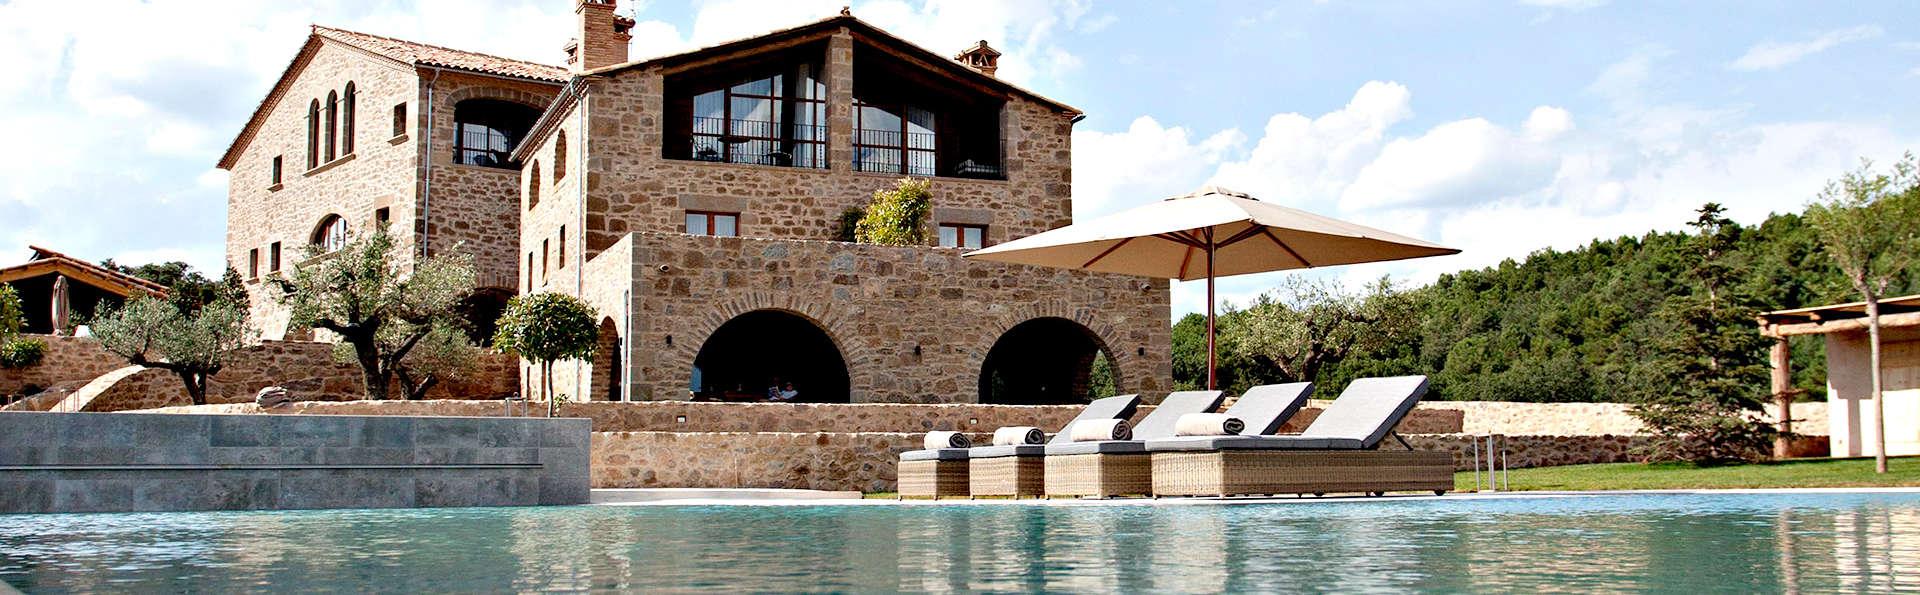 Hotel La Vella Farga - Edit_Front.jpg